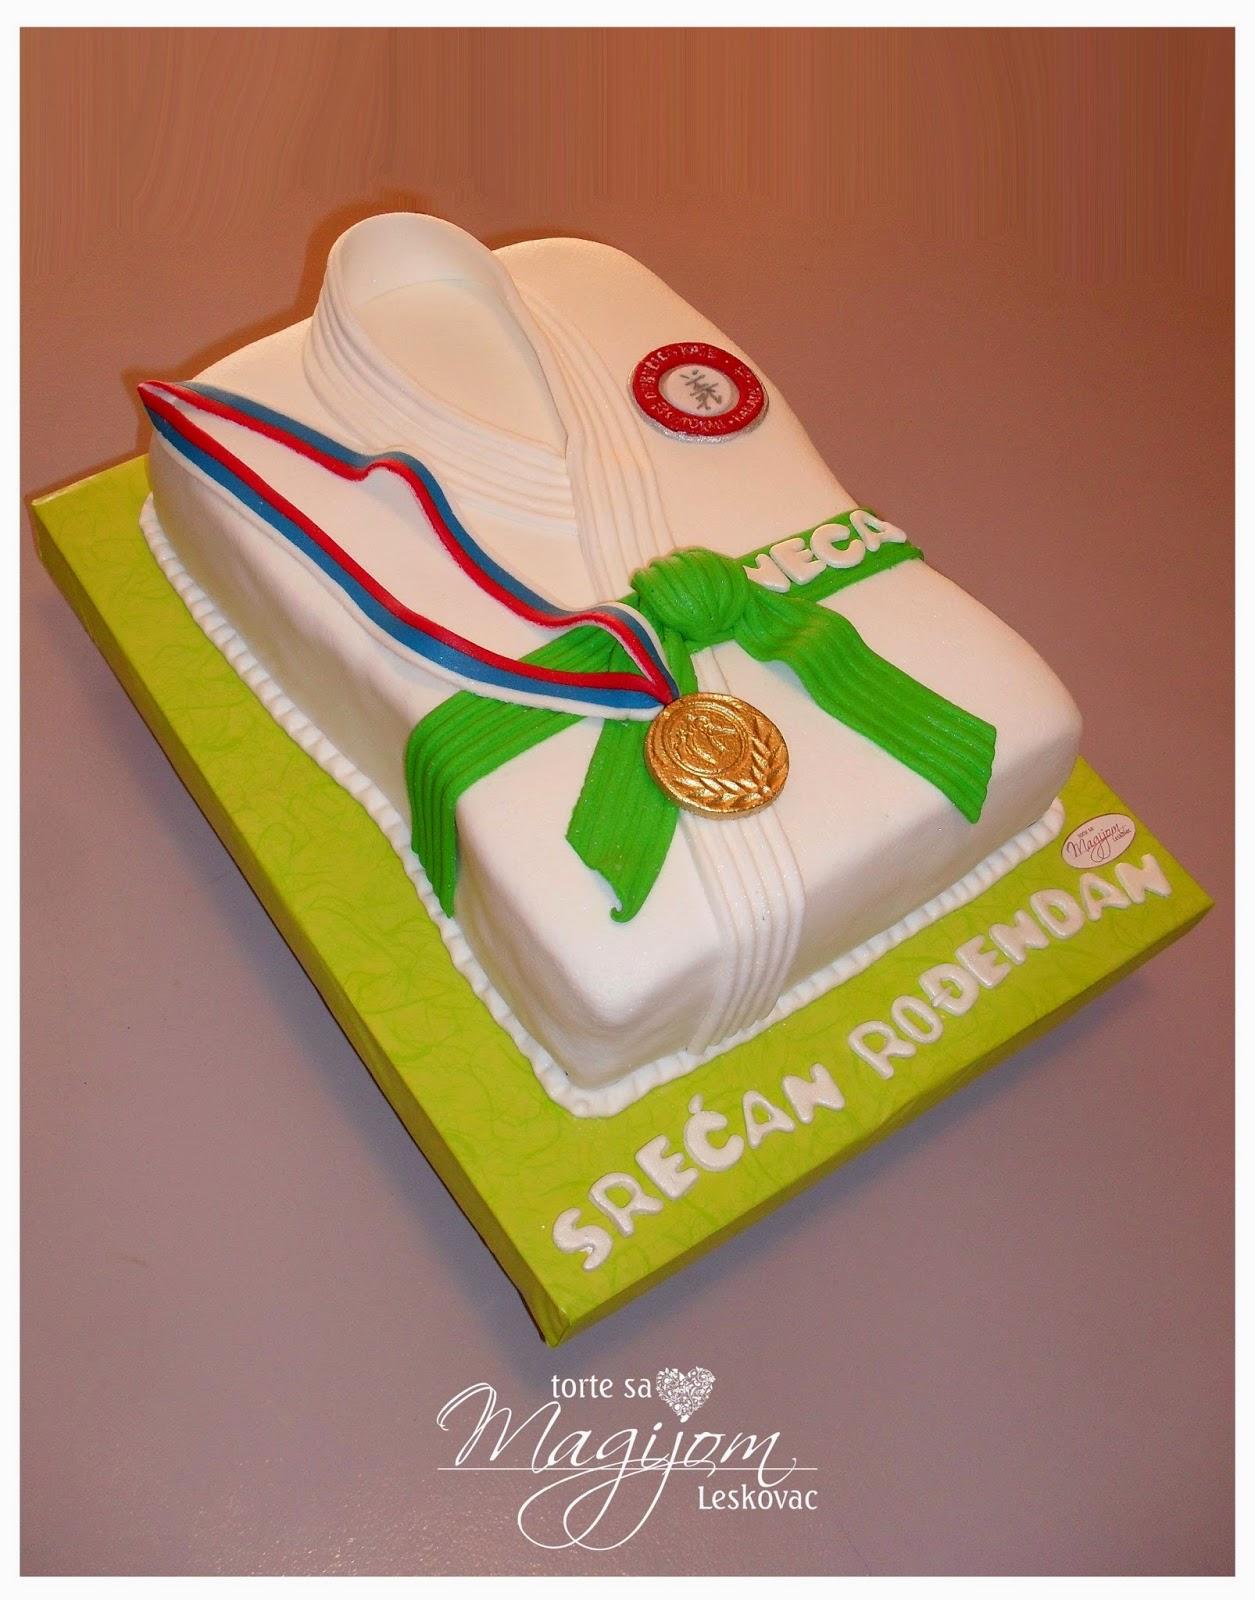 Torte sa magijom leskovac karate kimono torta for Decorazione torte karate